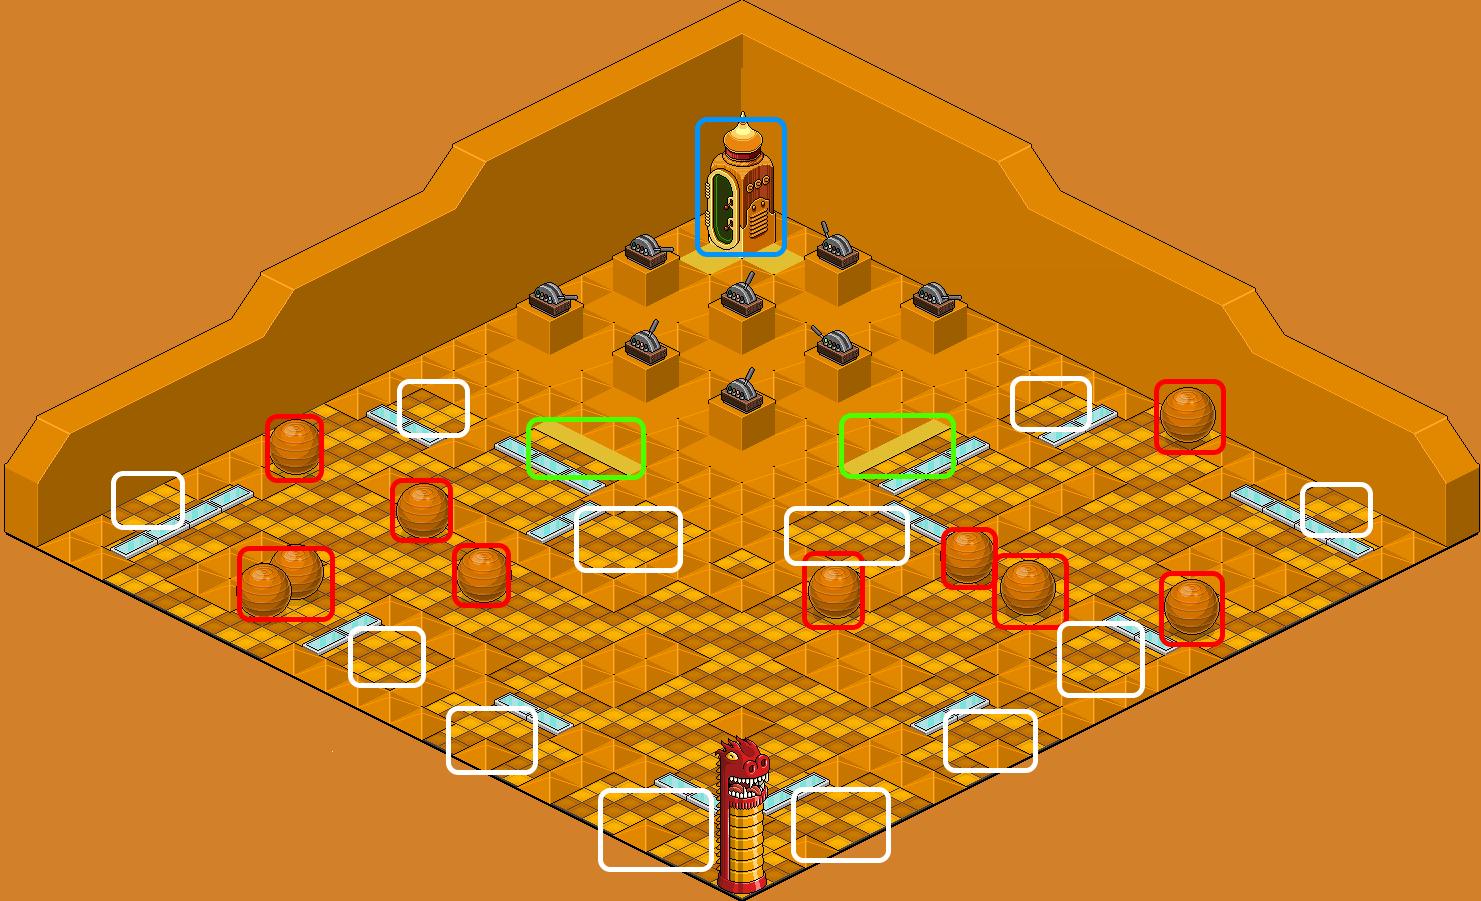 [Pride] Labyrinthe - Orange